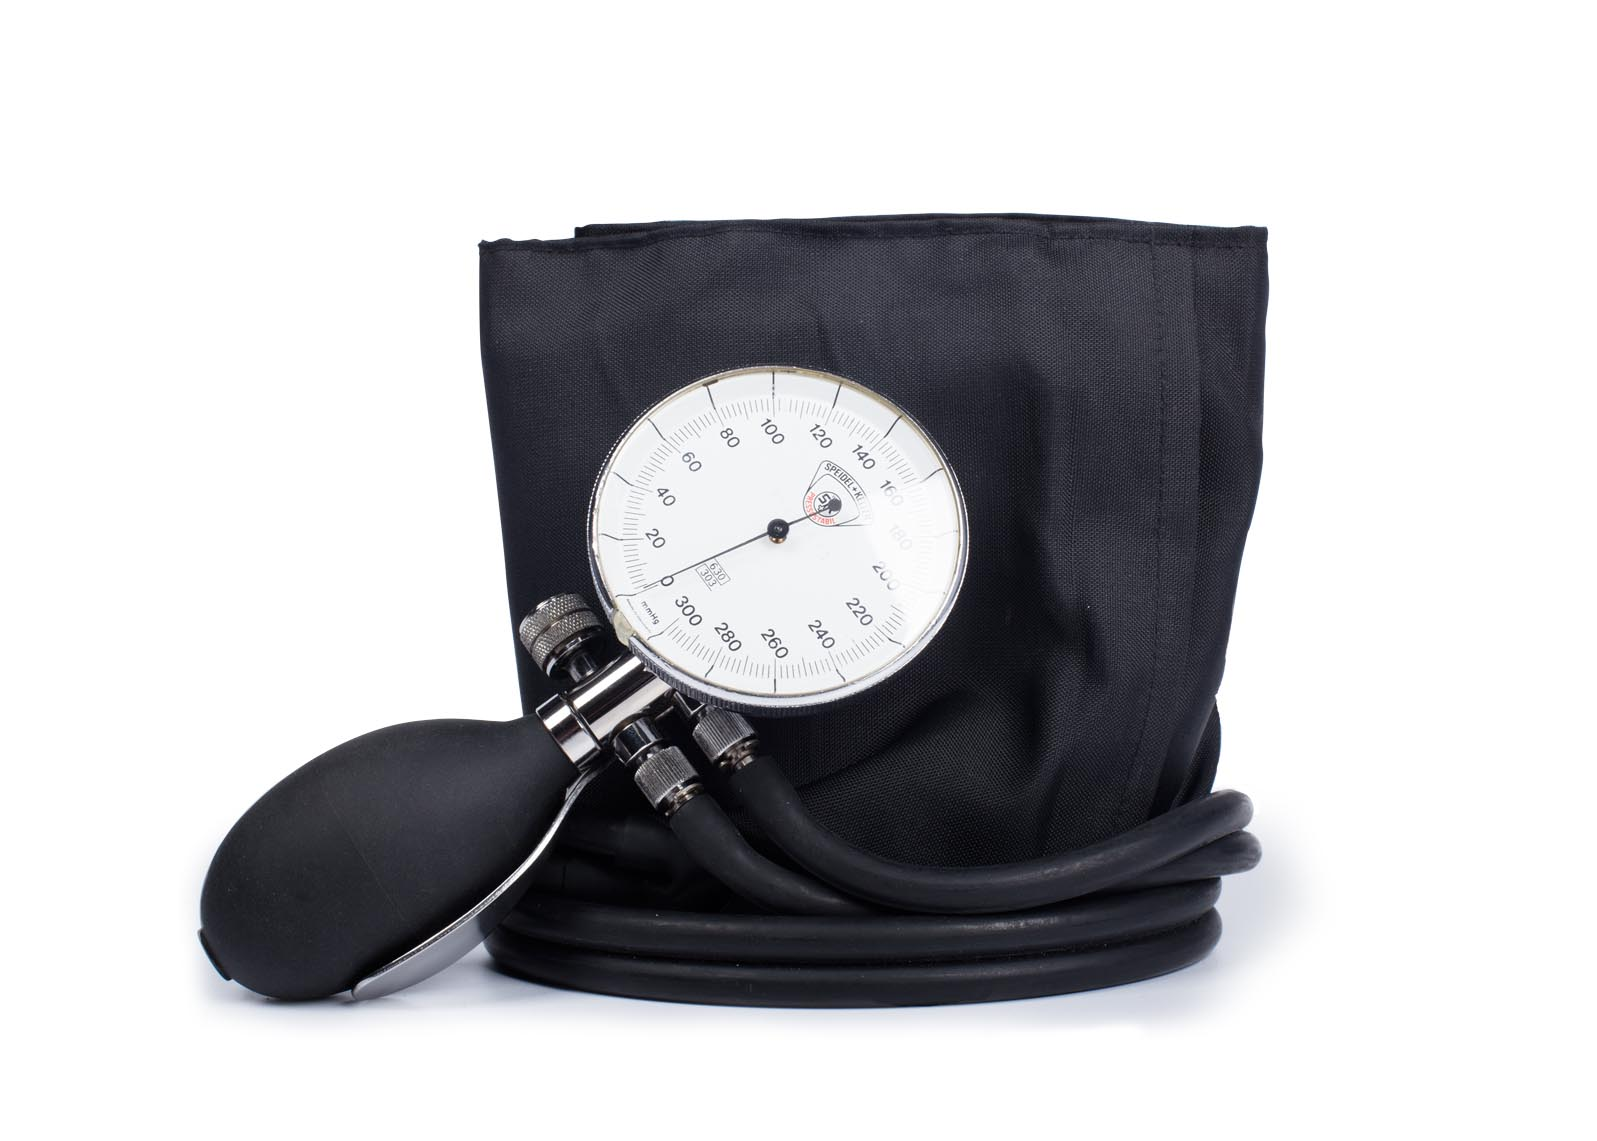 Messtechnische Kontrolle an aneroid Blutdruckmessgeräten